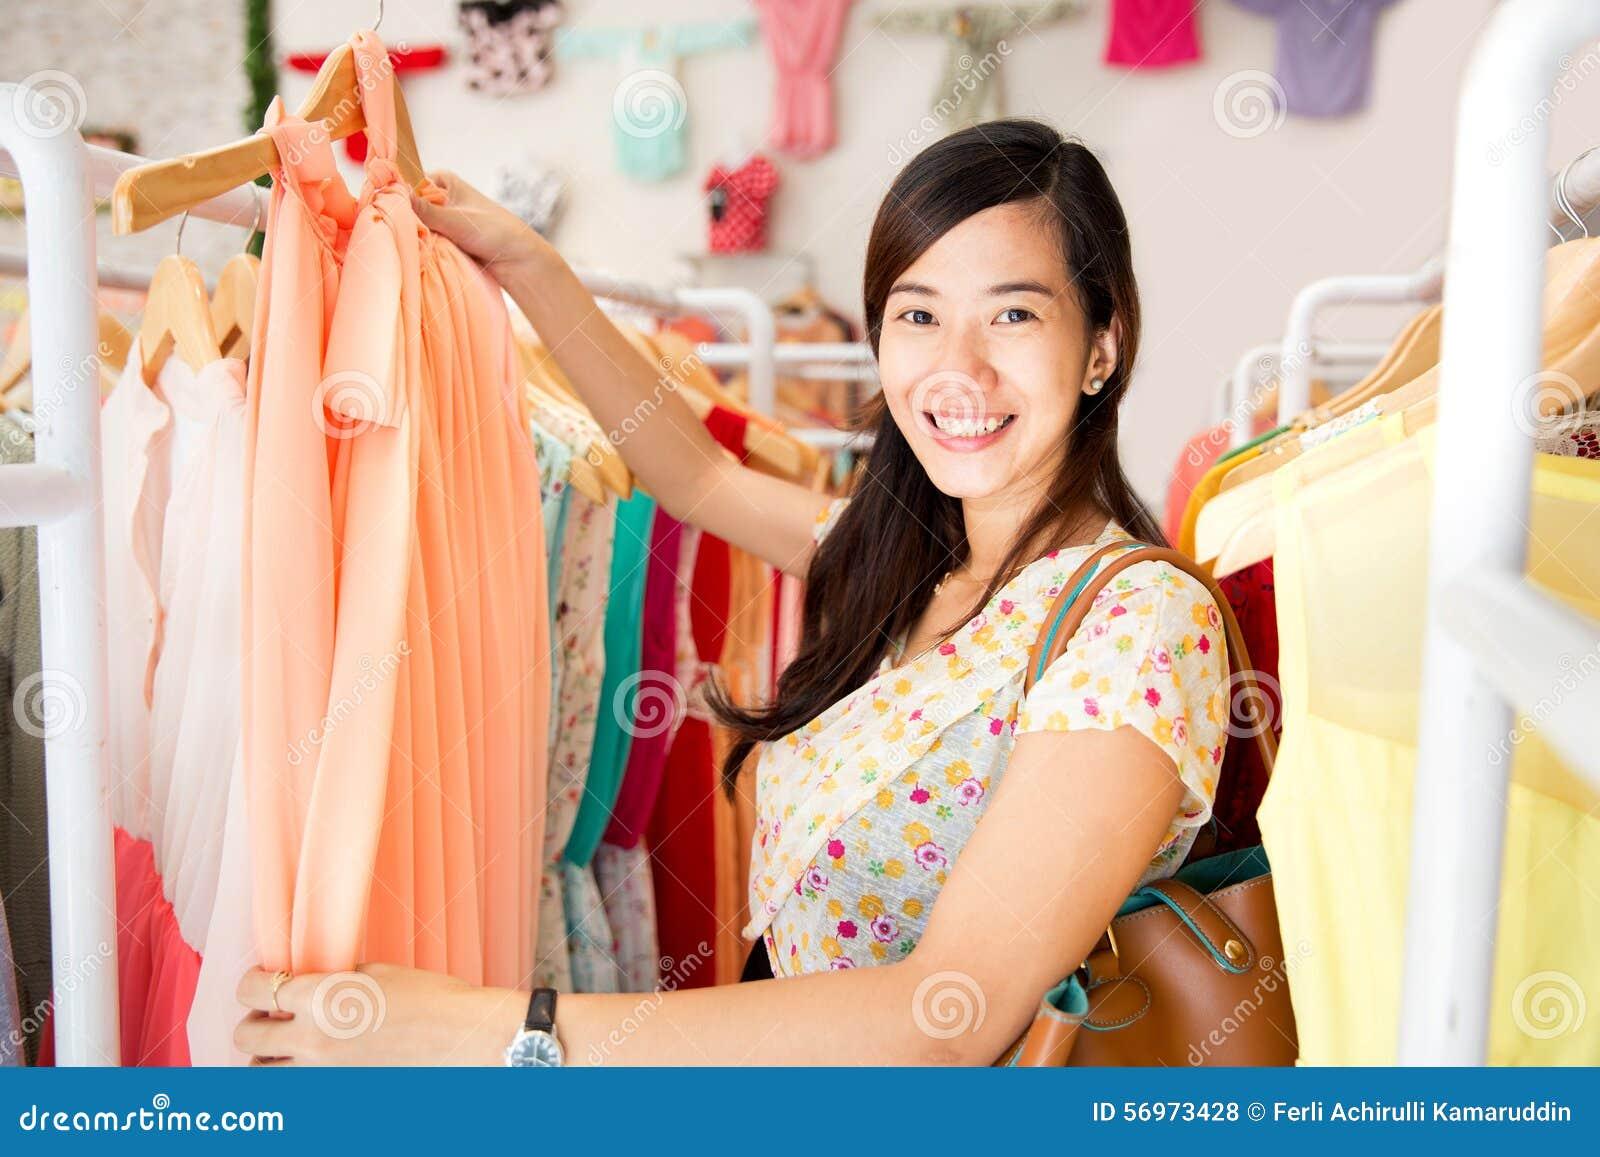 Shoppa lagerkvinna